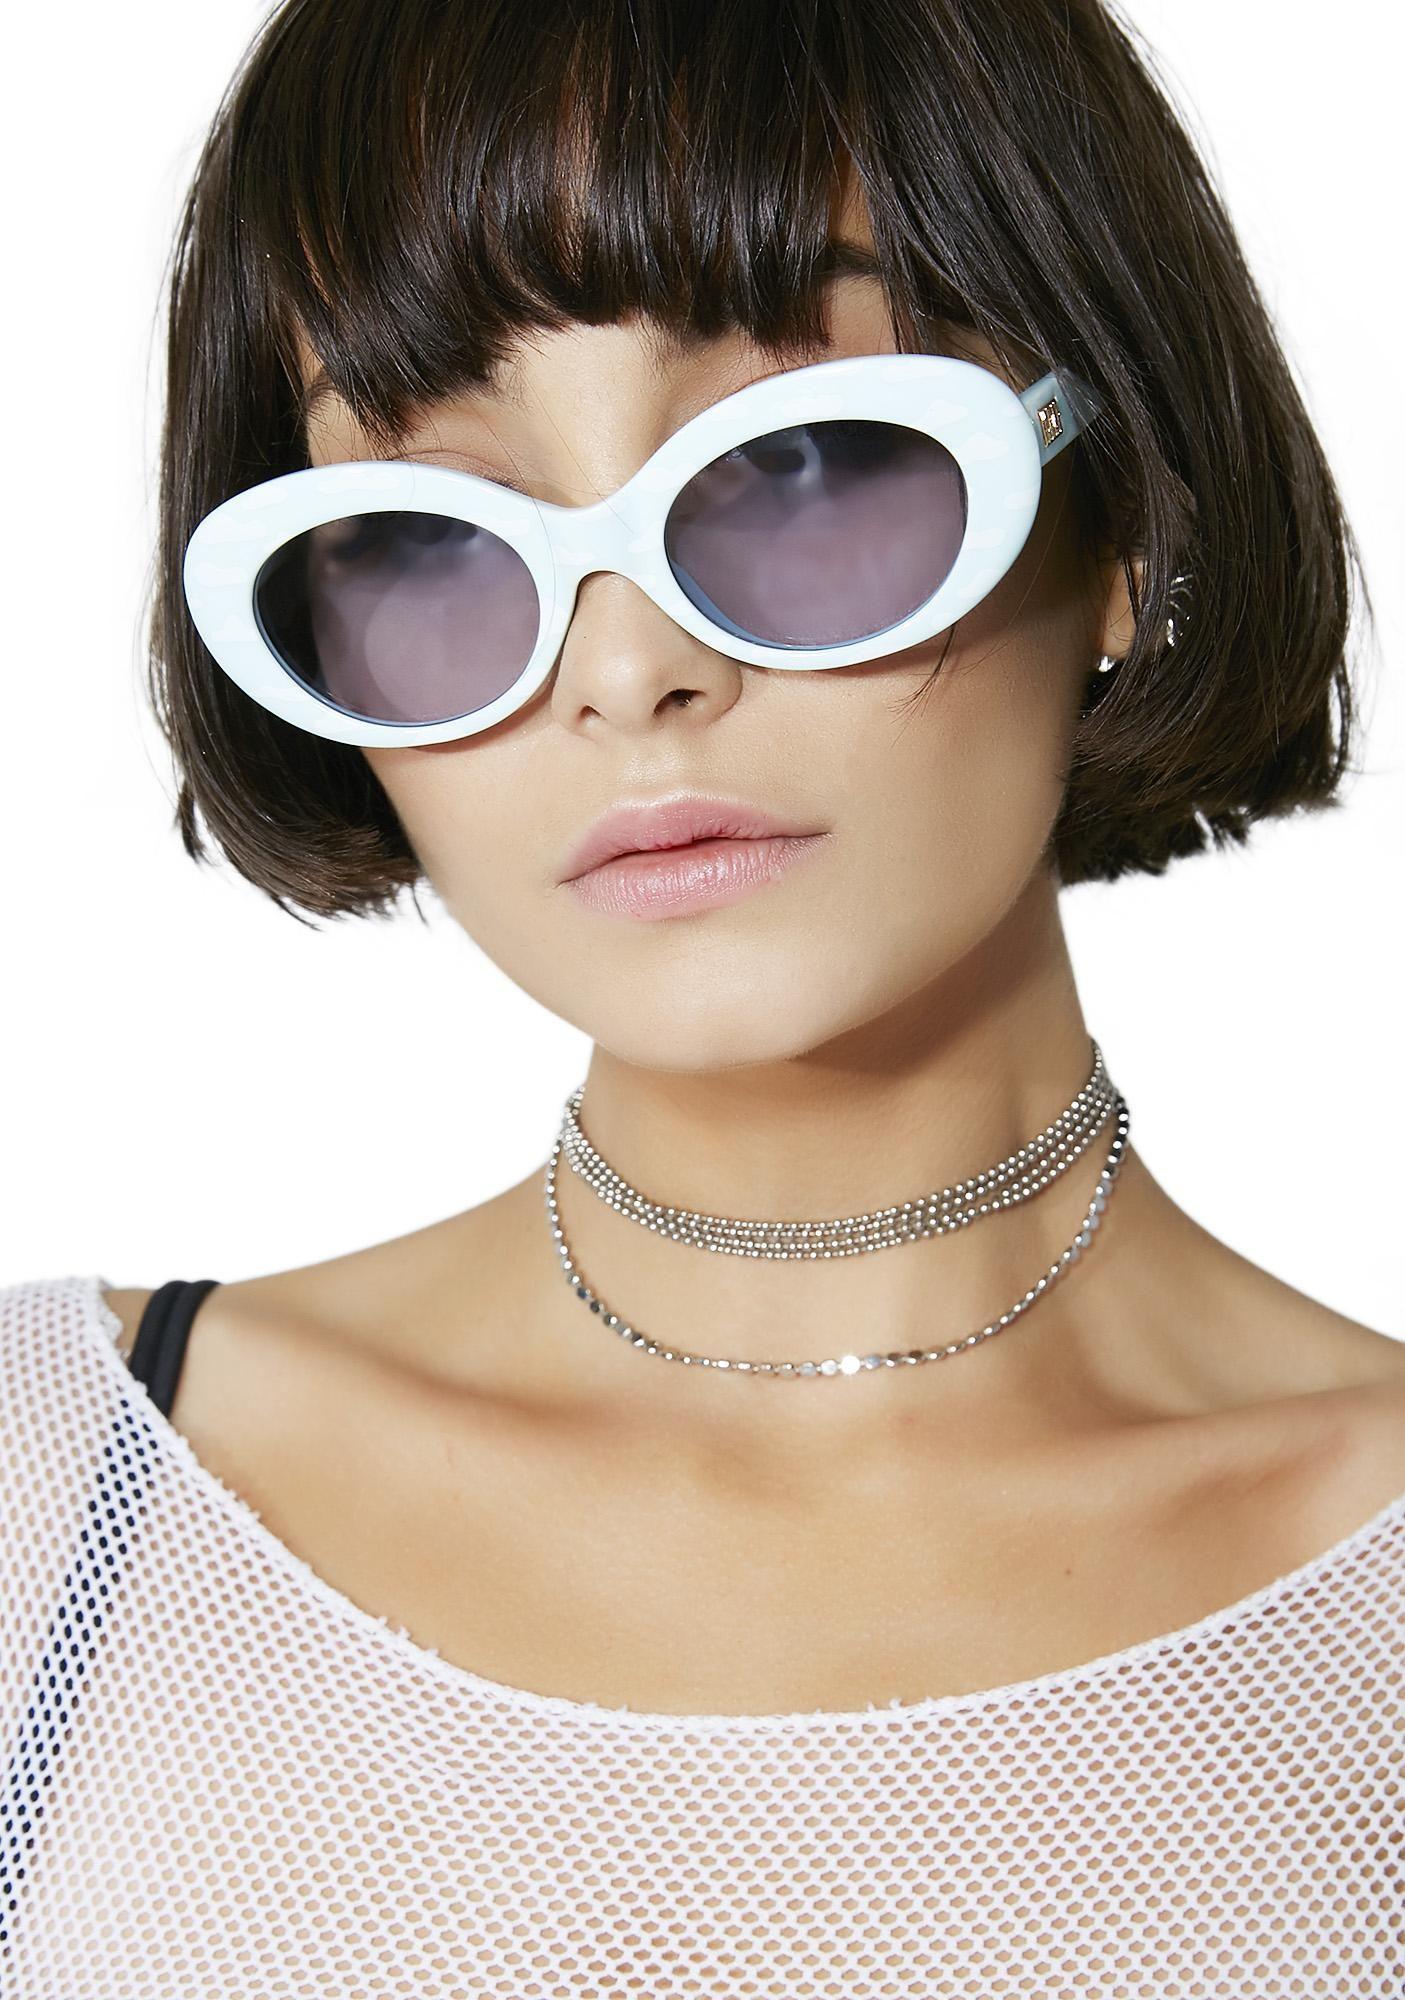 5038ce7b7e Crap Eyewear The Love Tempo Sky Sunglasses yew can t help havin  yer head